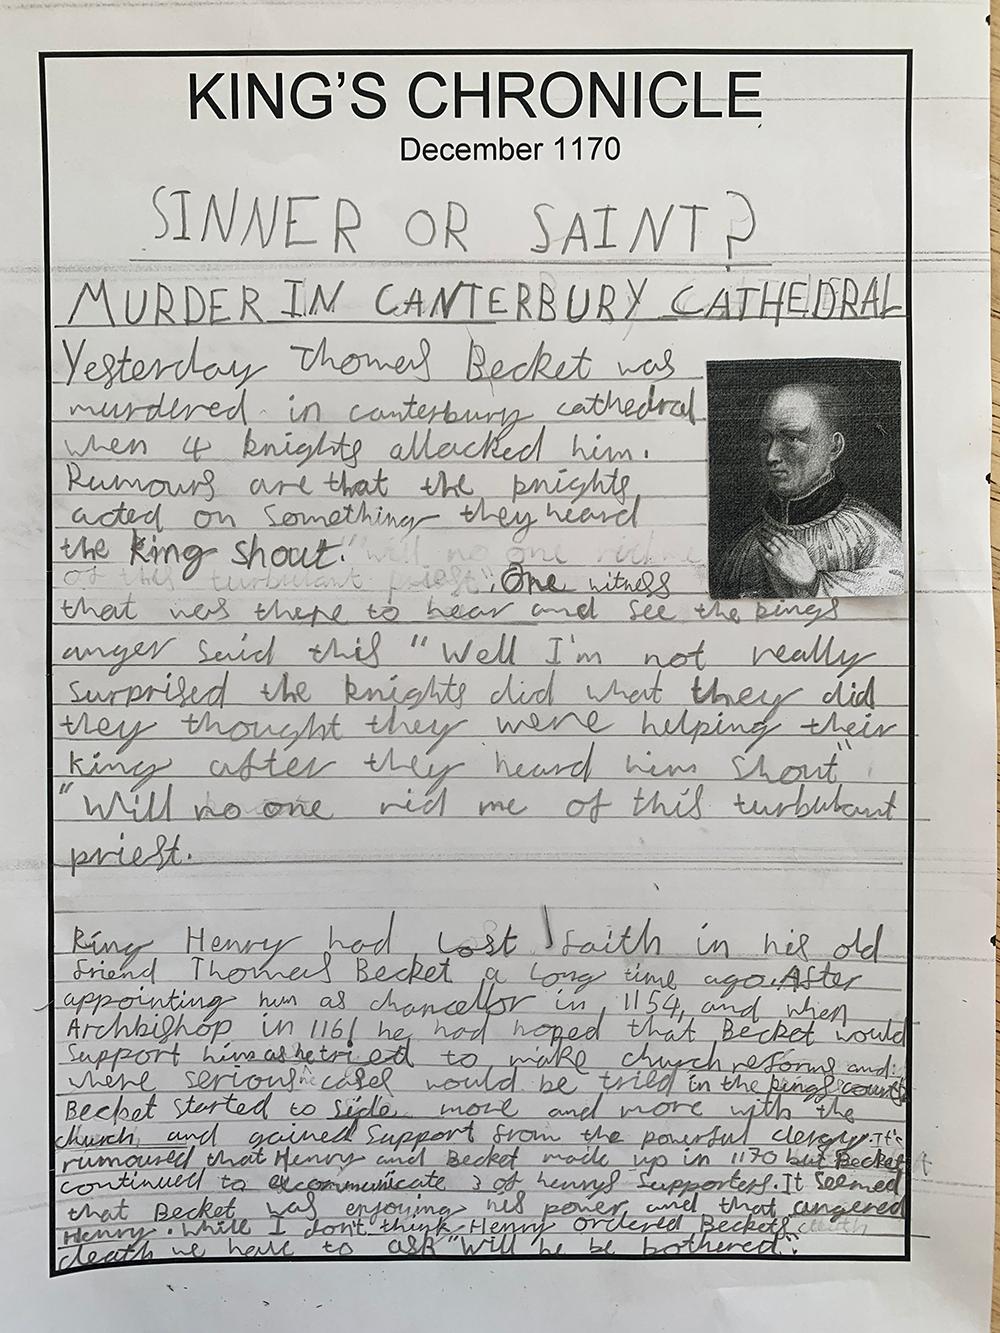 Becket Sinner or Saint Newspaper article 30 Jan 2021 at 11 14